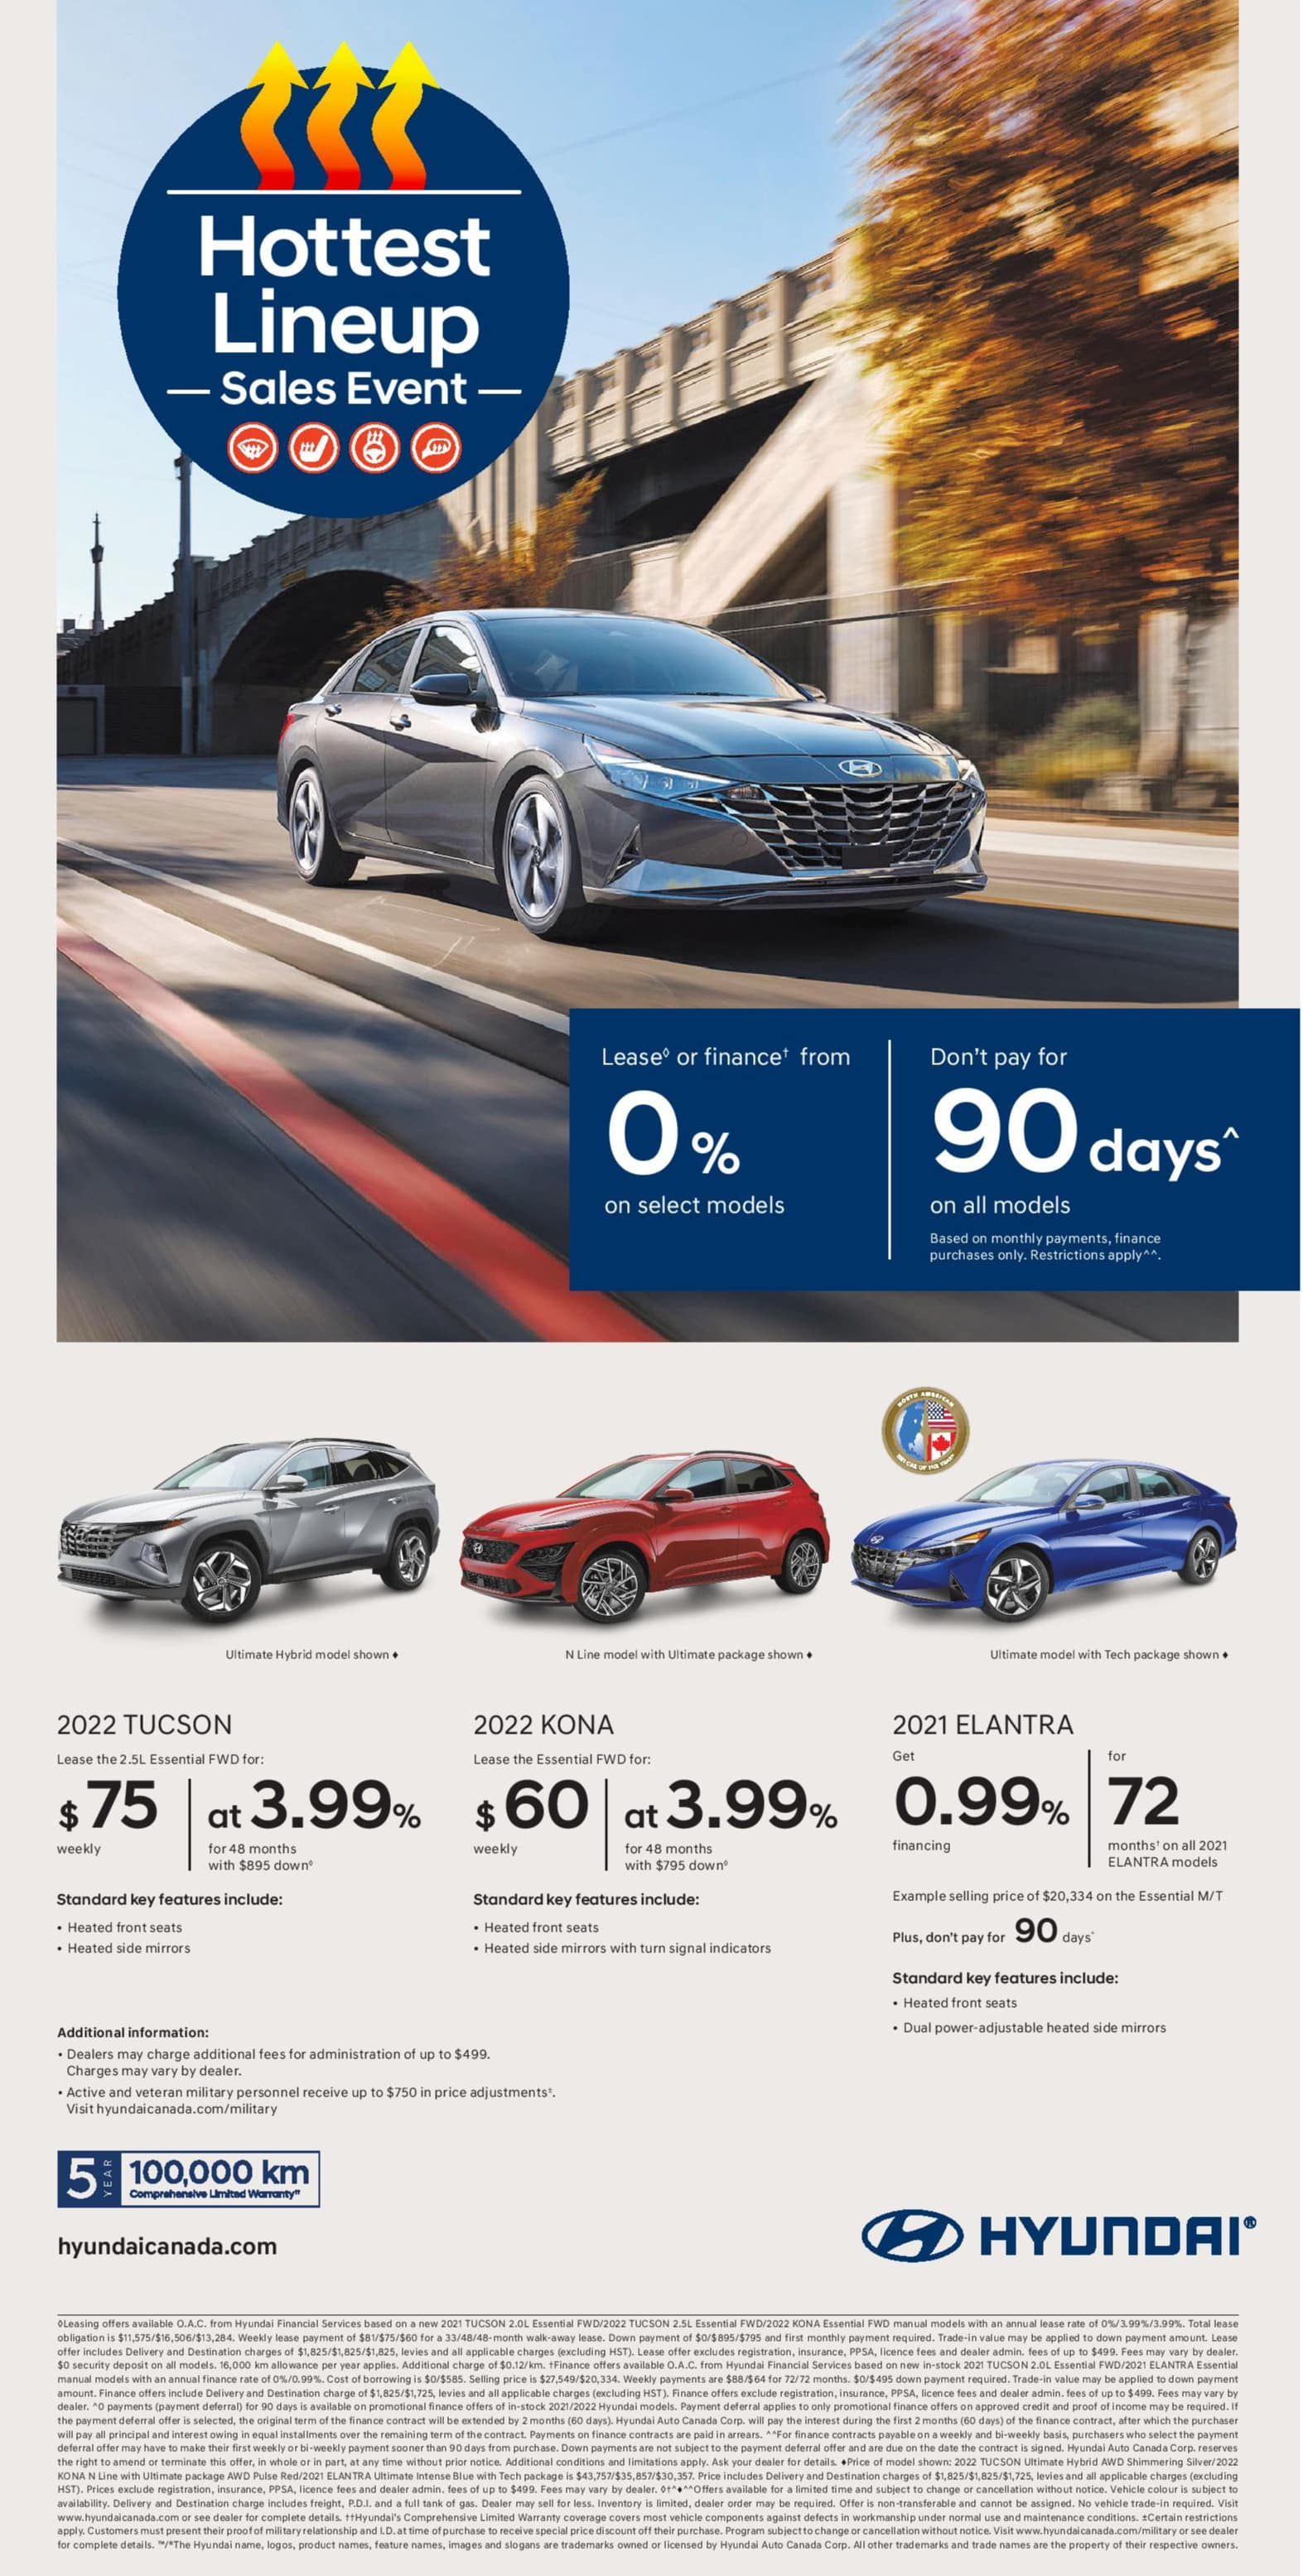 Hyundai Hottest Lineup Sales Event